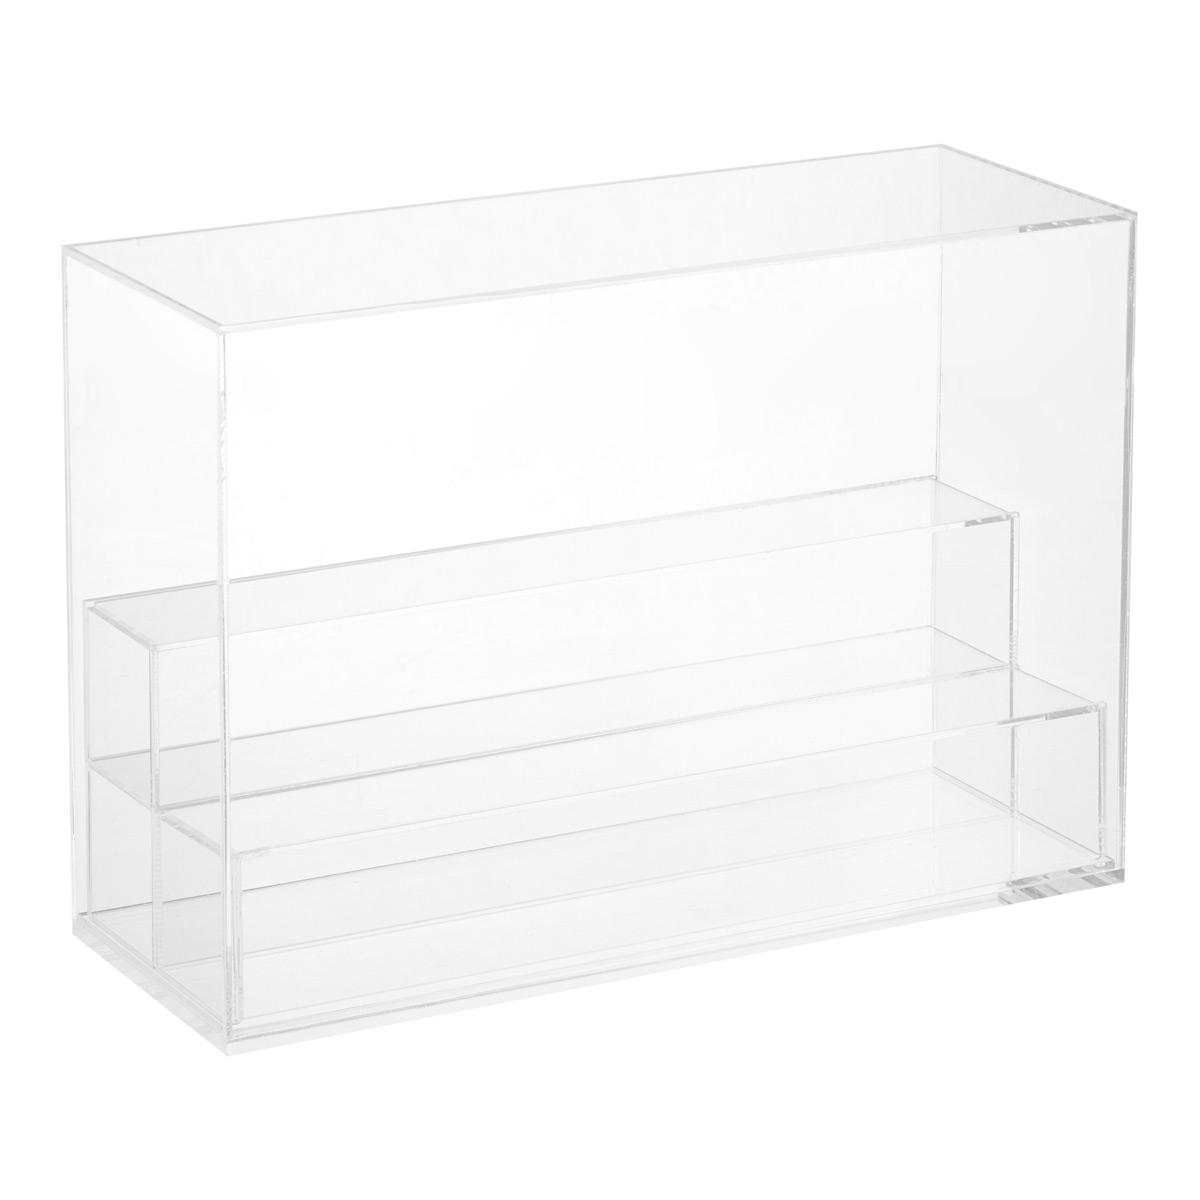 Large Modular Clear Acrylic Premium Display Case